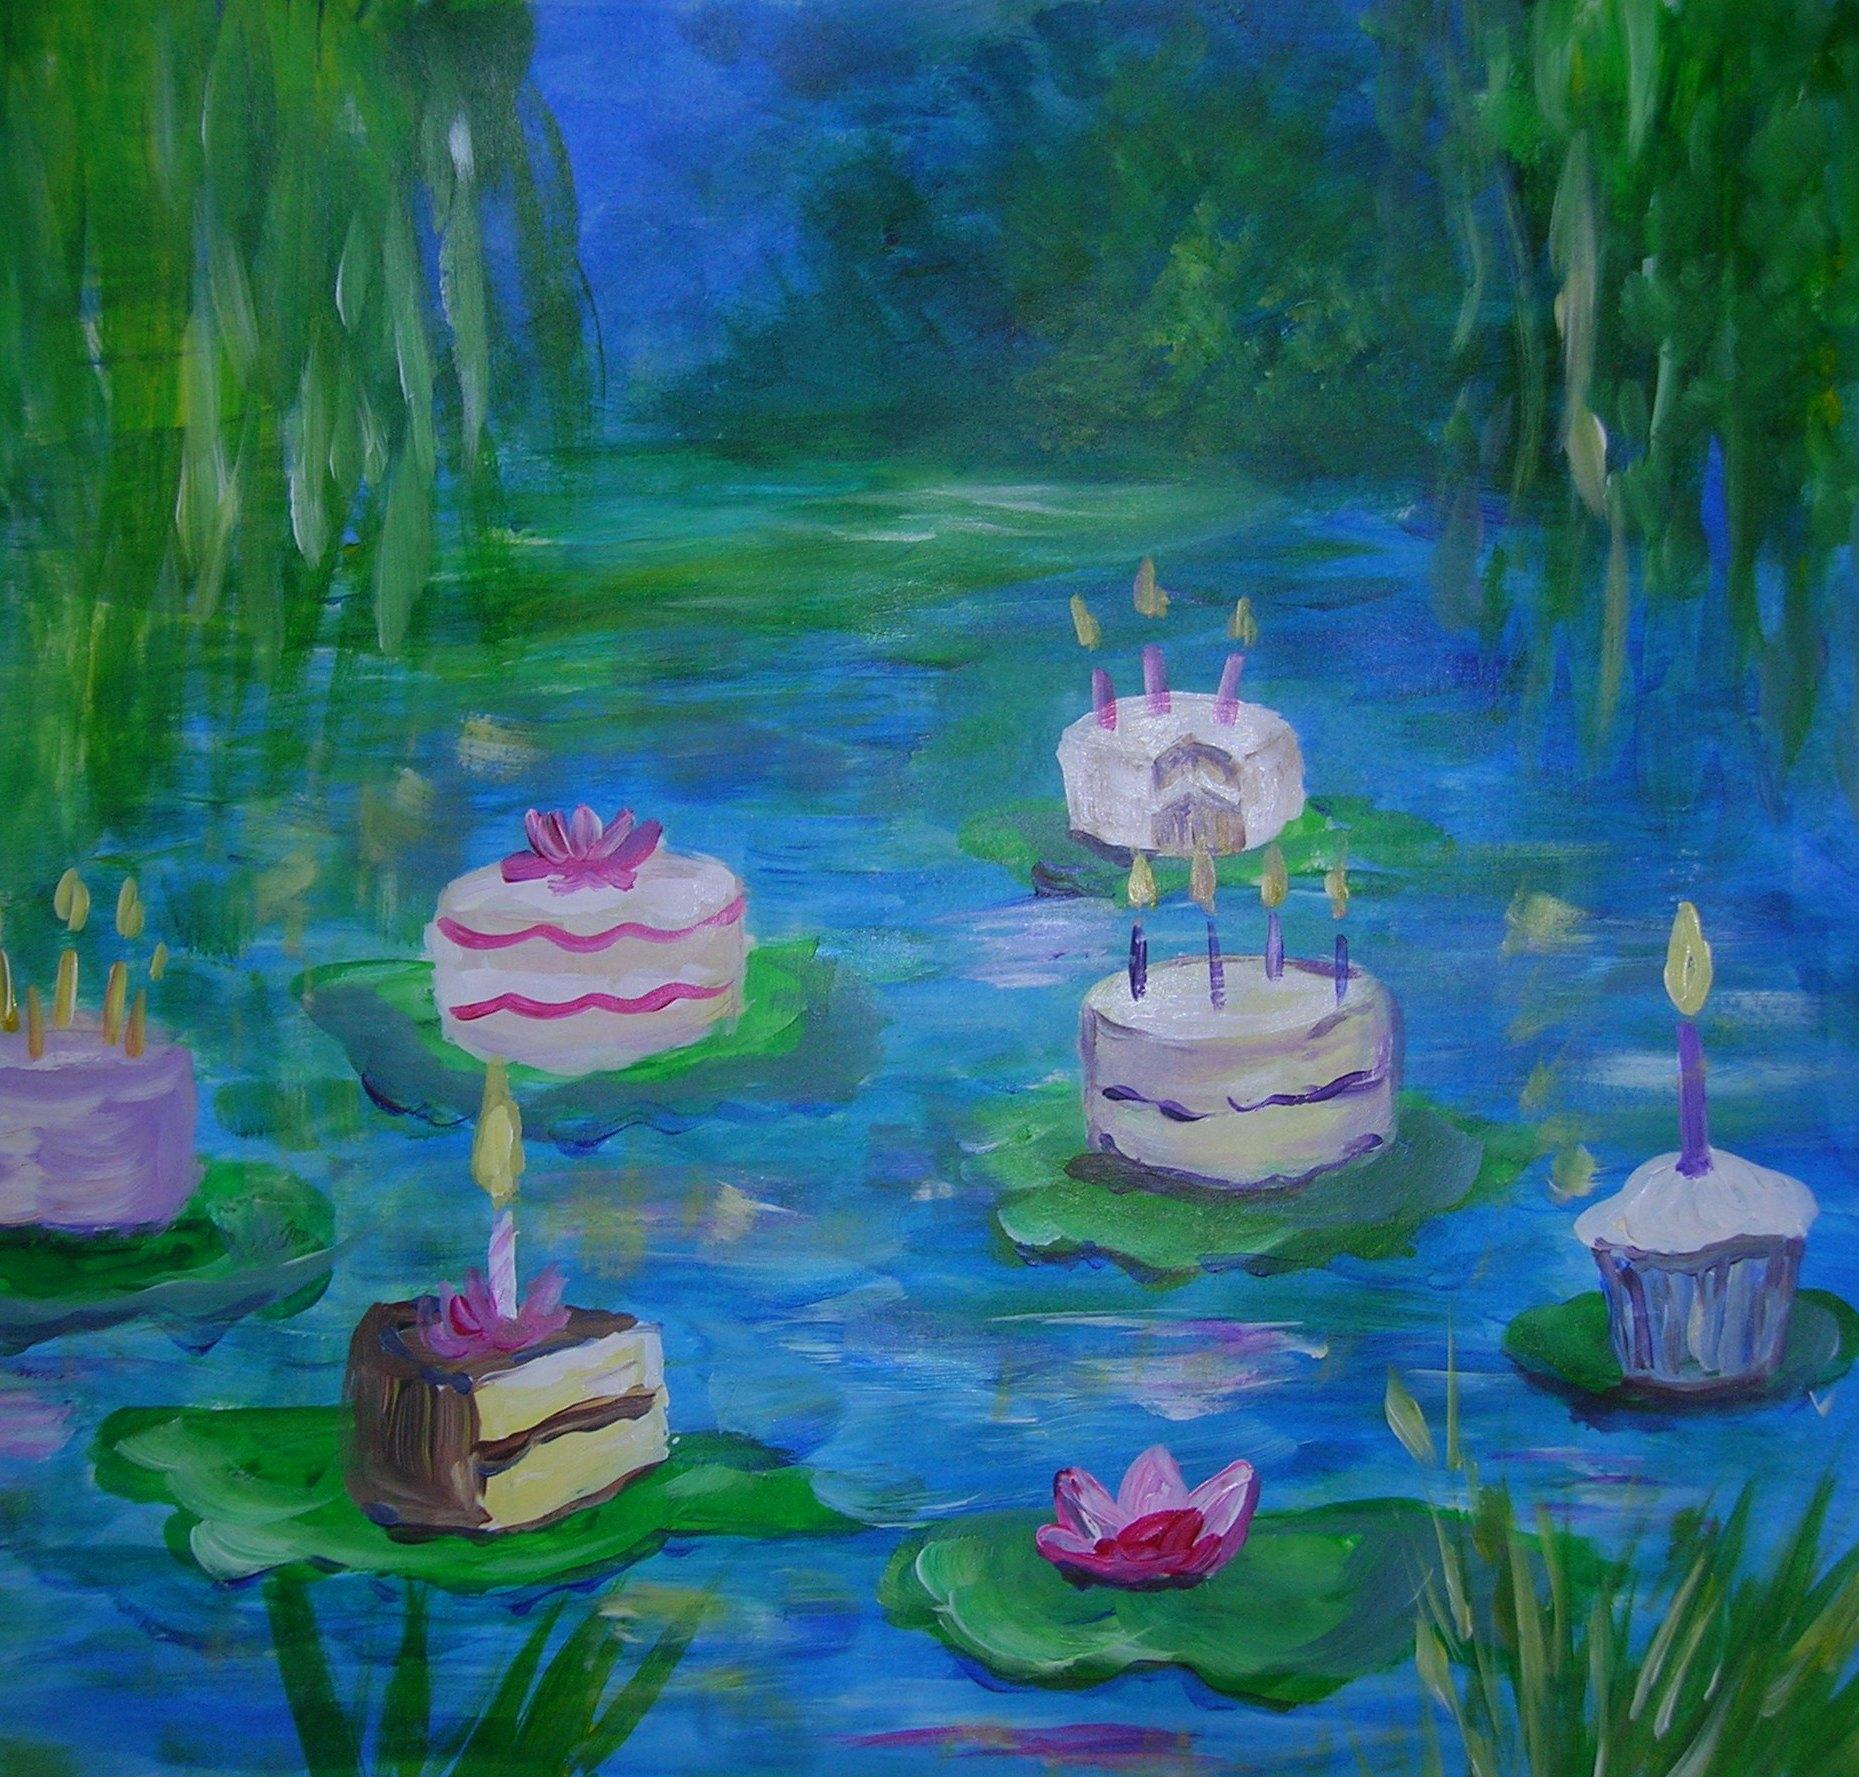 Pics Quiz Cake Art Mo : Artsy Birthday Cakes - ProProfs Quiz